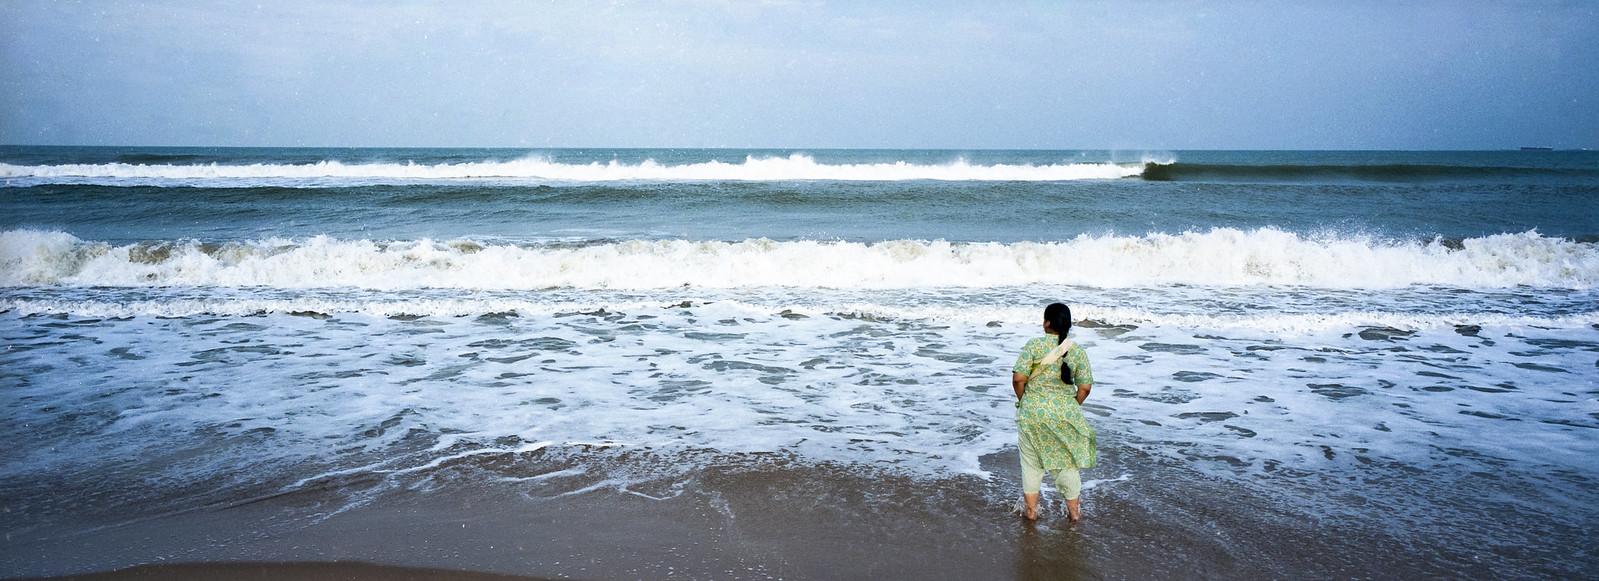 Mum at the Beach, Madras, India